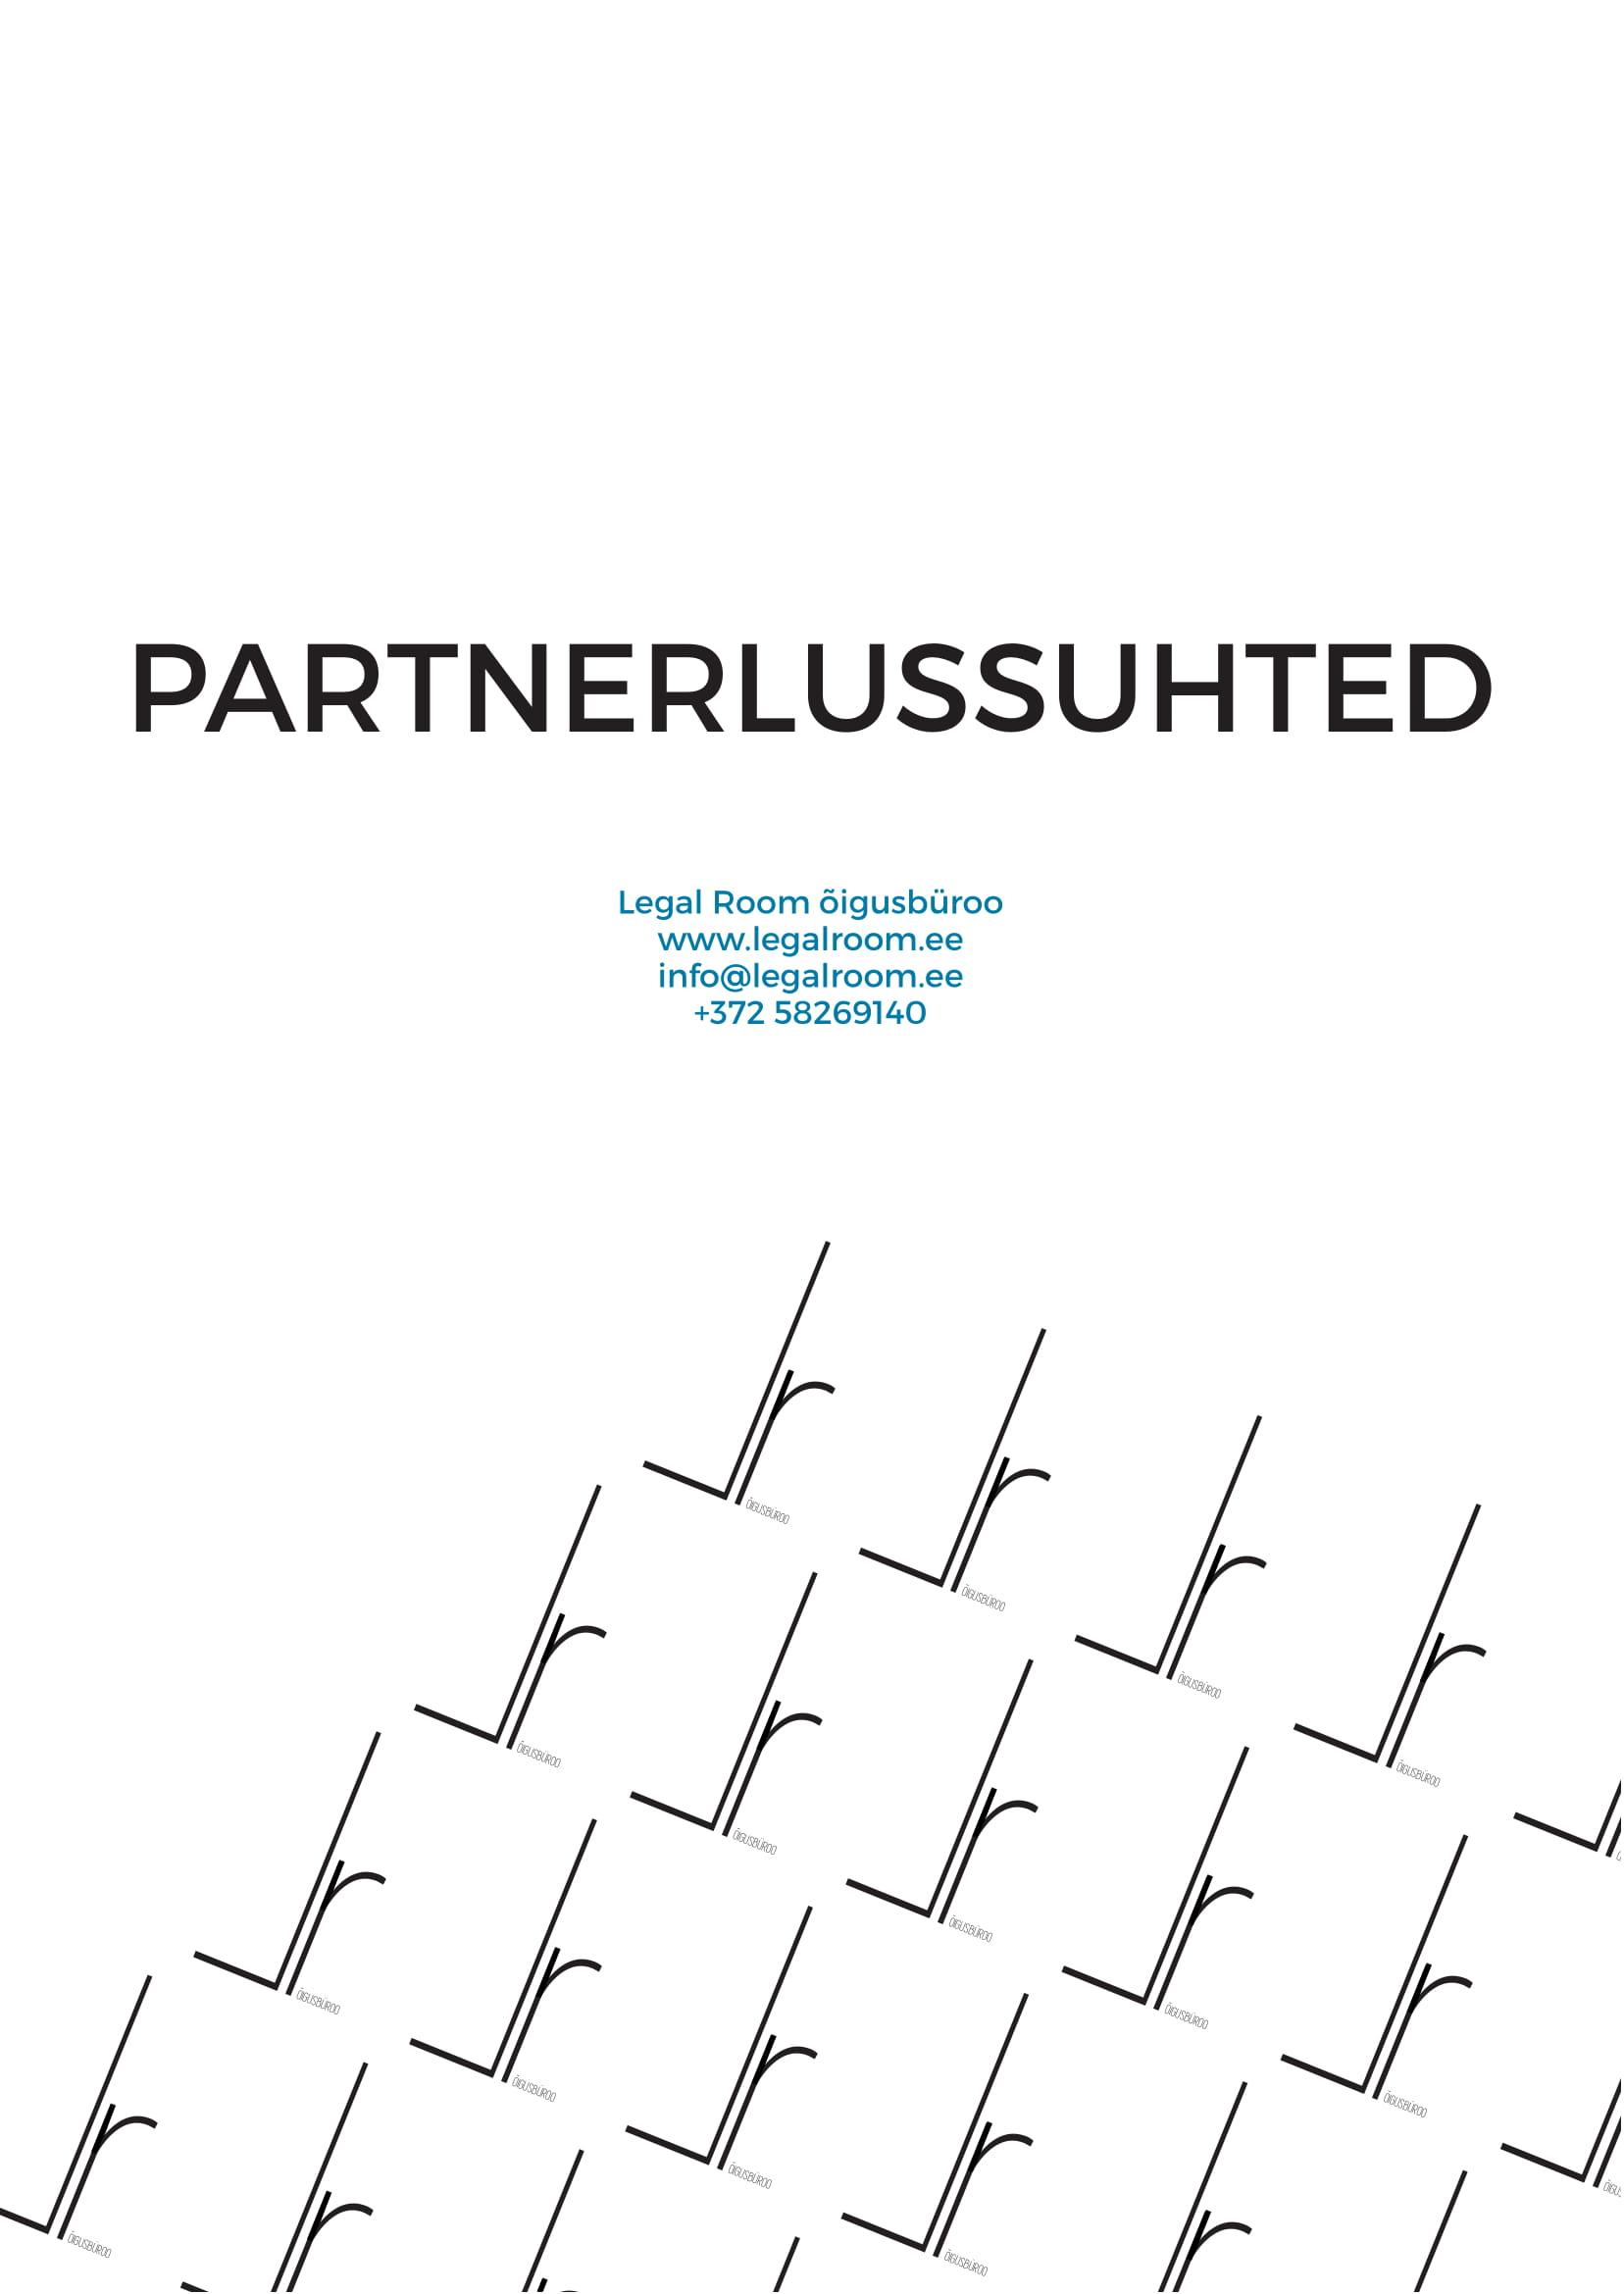 Partnerlussuhted 2017-1-2 (1)-1-1.jpg